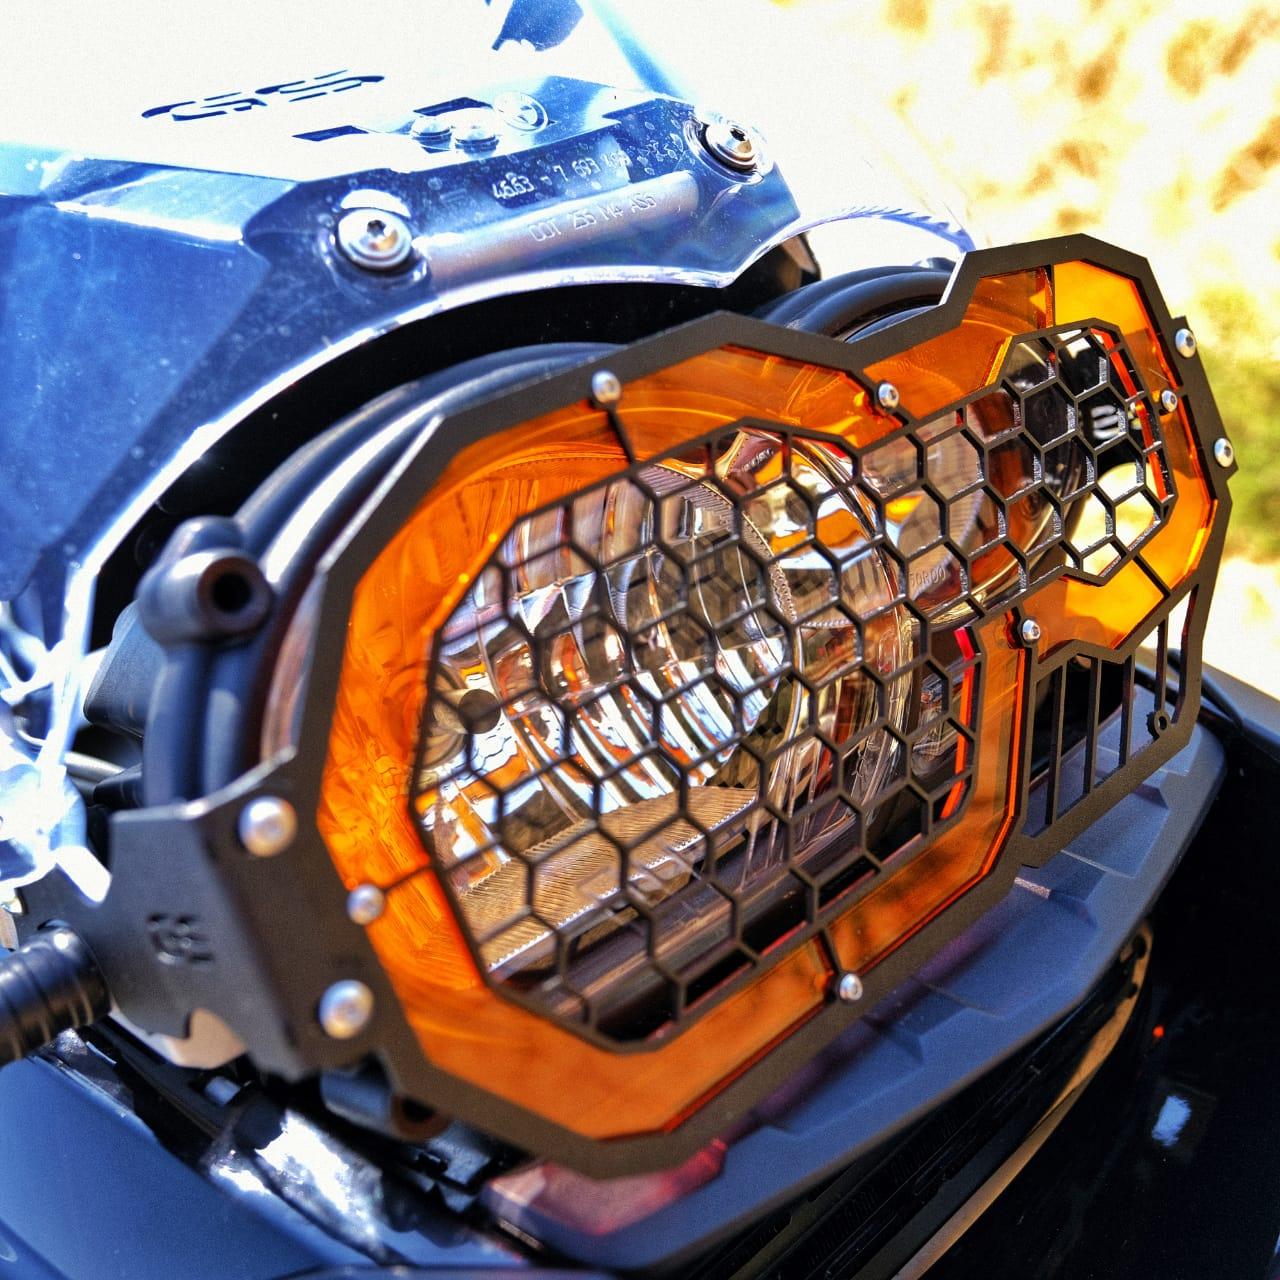 BMW 1200 GS headlight guards